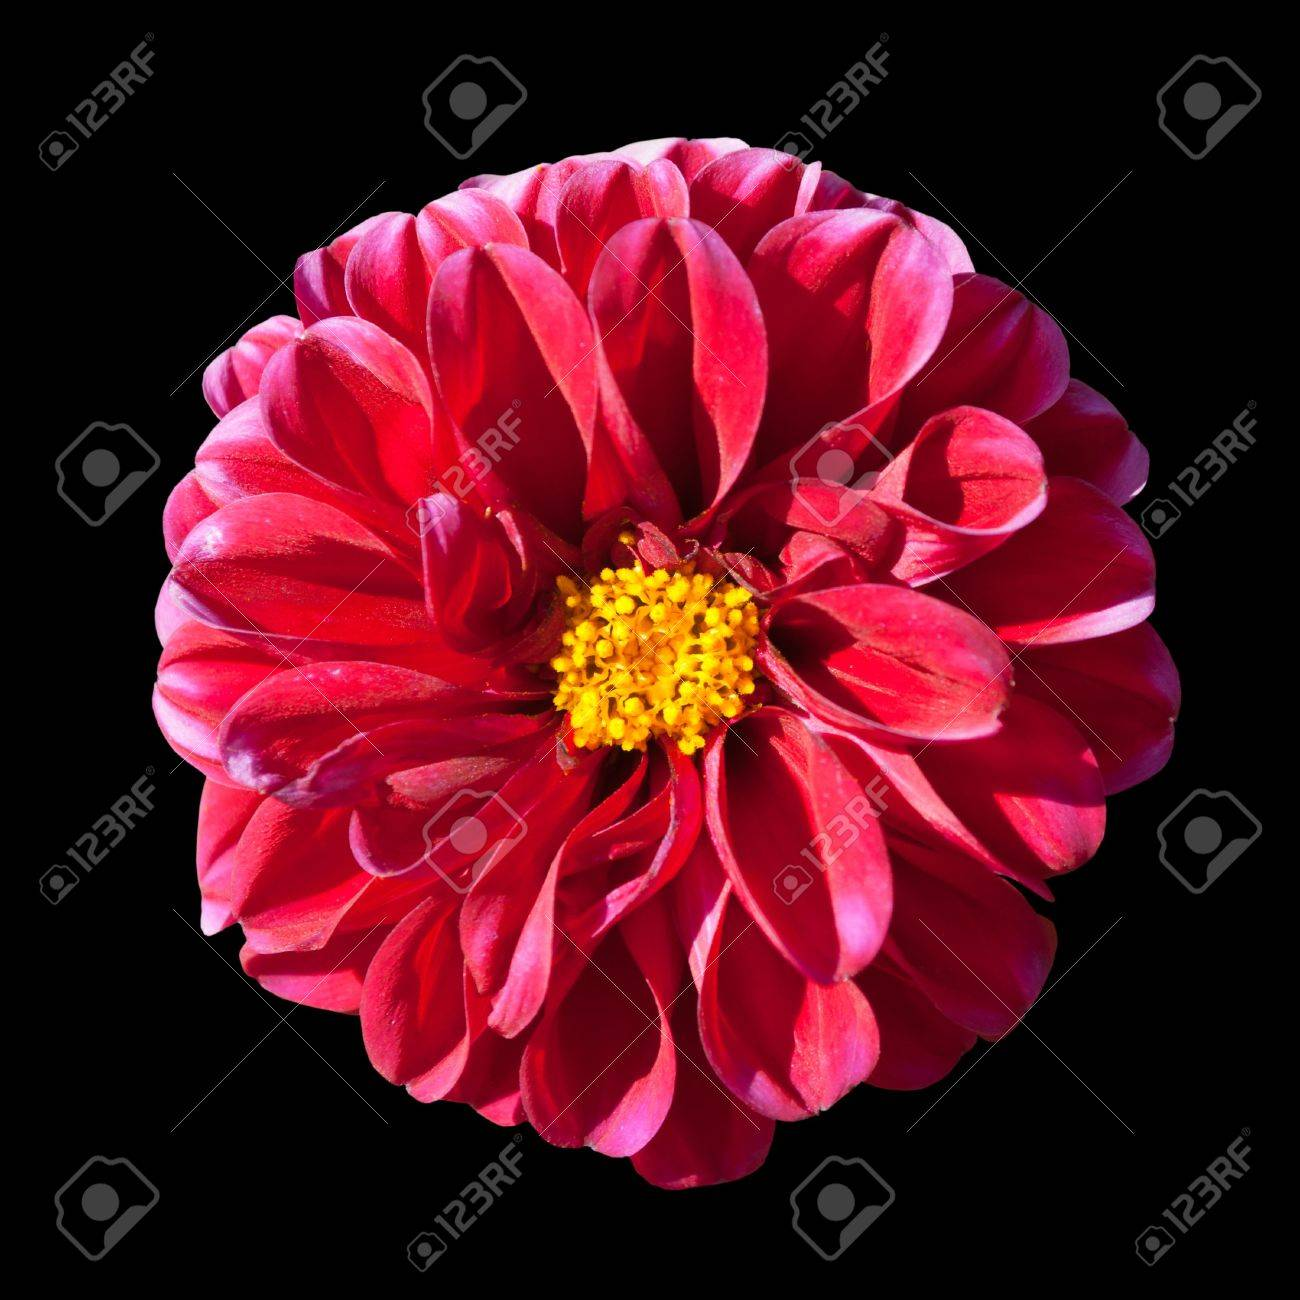 Beautiful red dahlia flower with yellow center isolated on black beautiful red dahlia flower with yellow center isolated on black background stock photo 7877297 izmirmasajfo